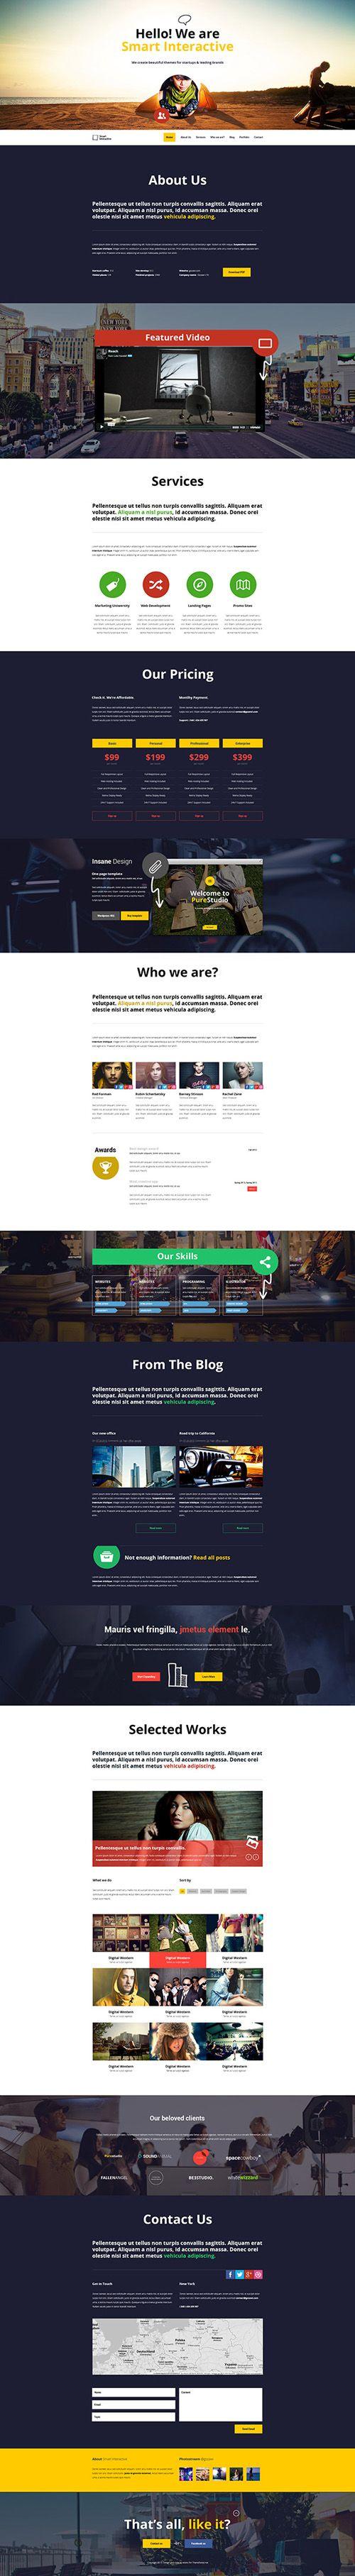 Smart Interactive HTML5 one page creative parallax #wordpressthemes #responsivedesign #flatdesign